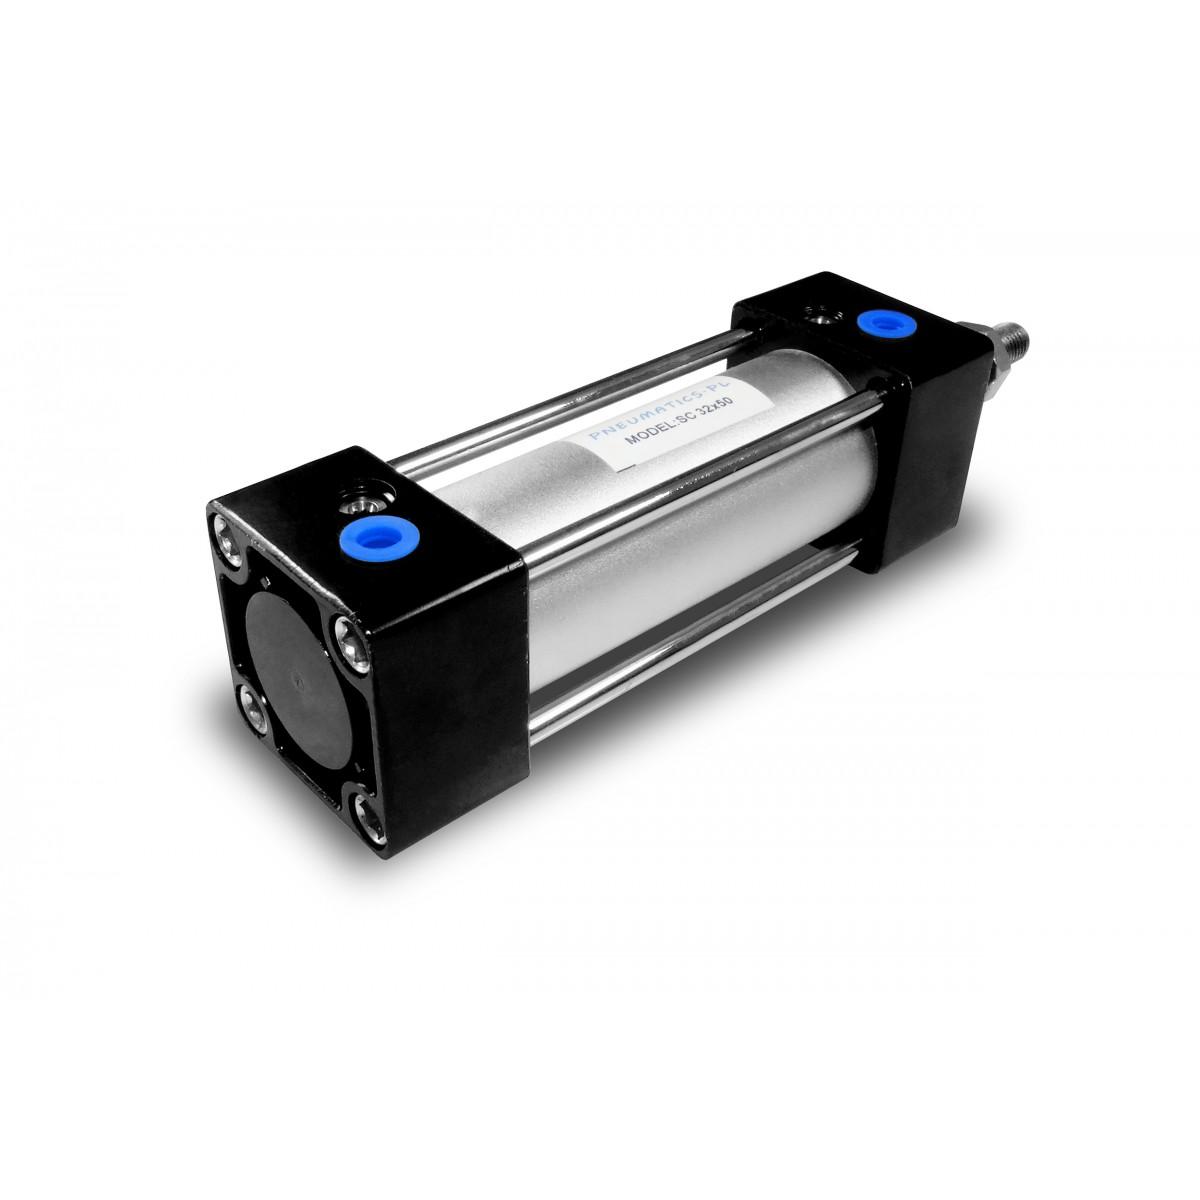 SC 100x320 ARIA CILINDRO potenza idraulica CILINDRO CILINDRO aircylinder CTSE 100x320